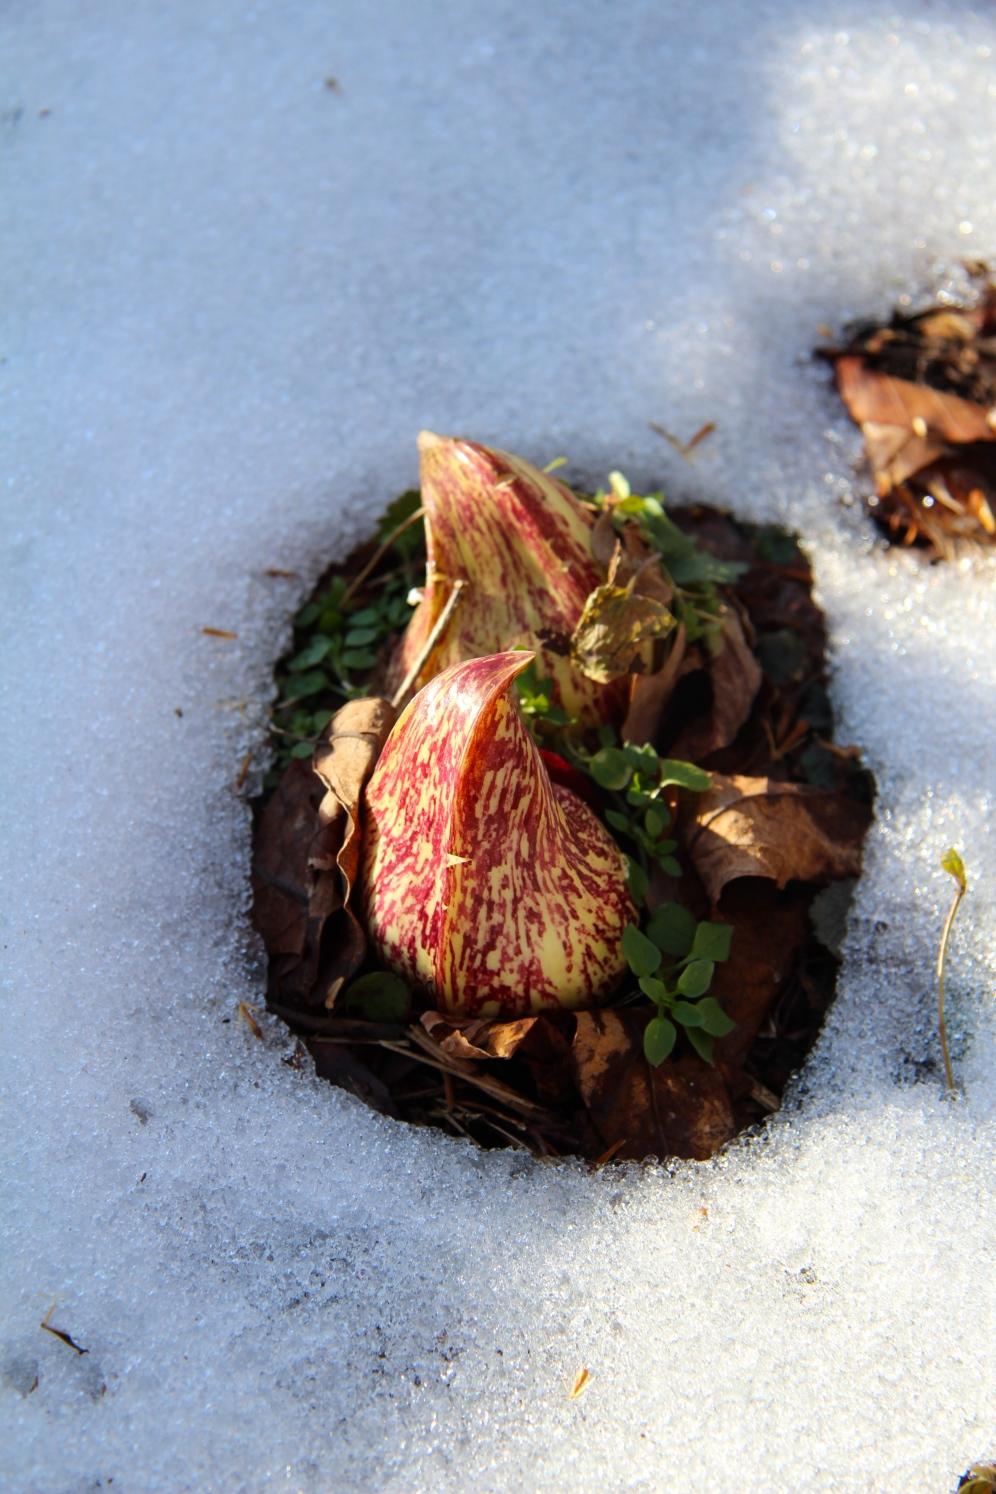 Flowering in the snow.